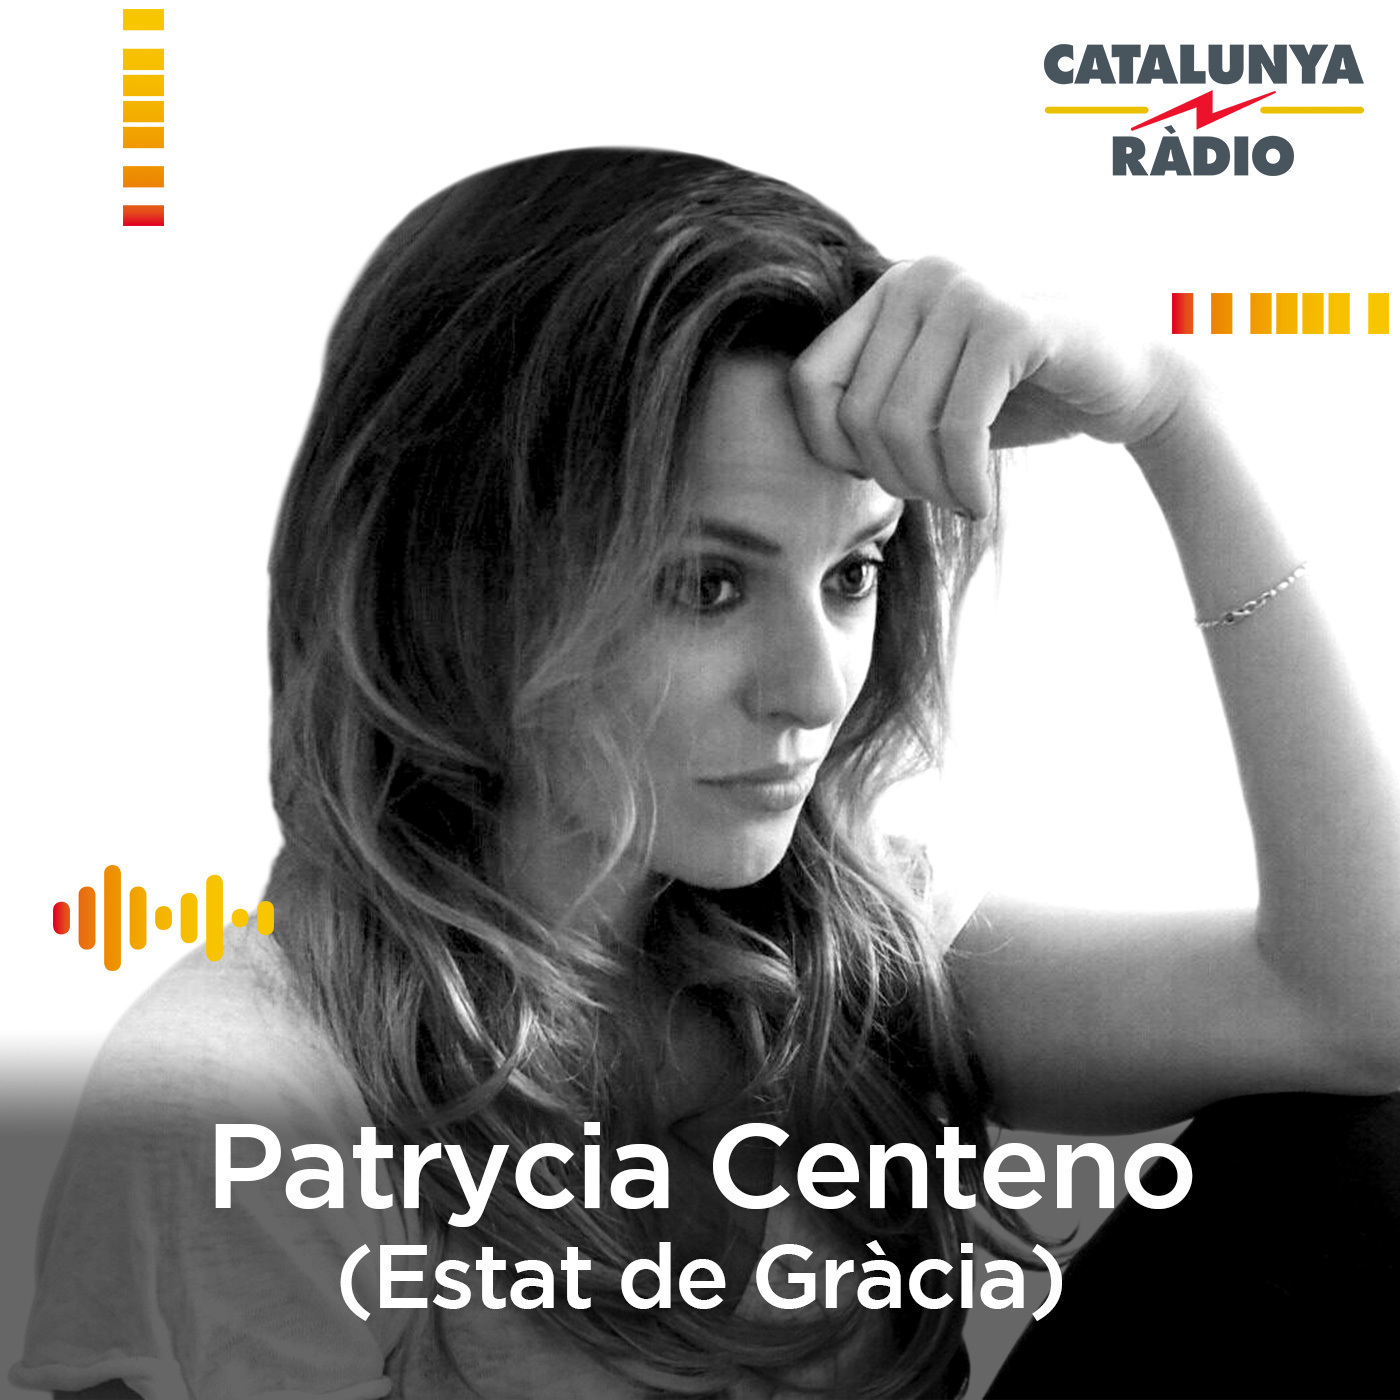 Comunicació no verbal, amb Patrycia Centeno